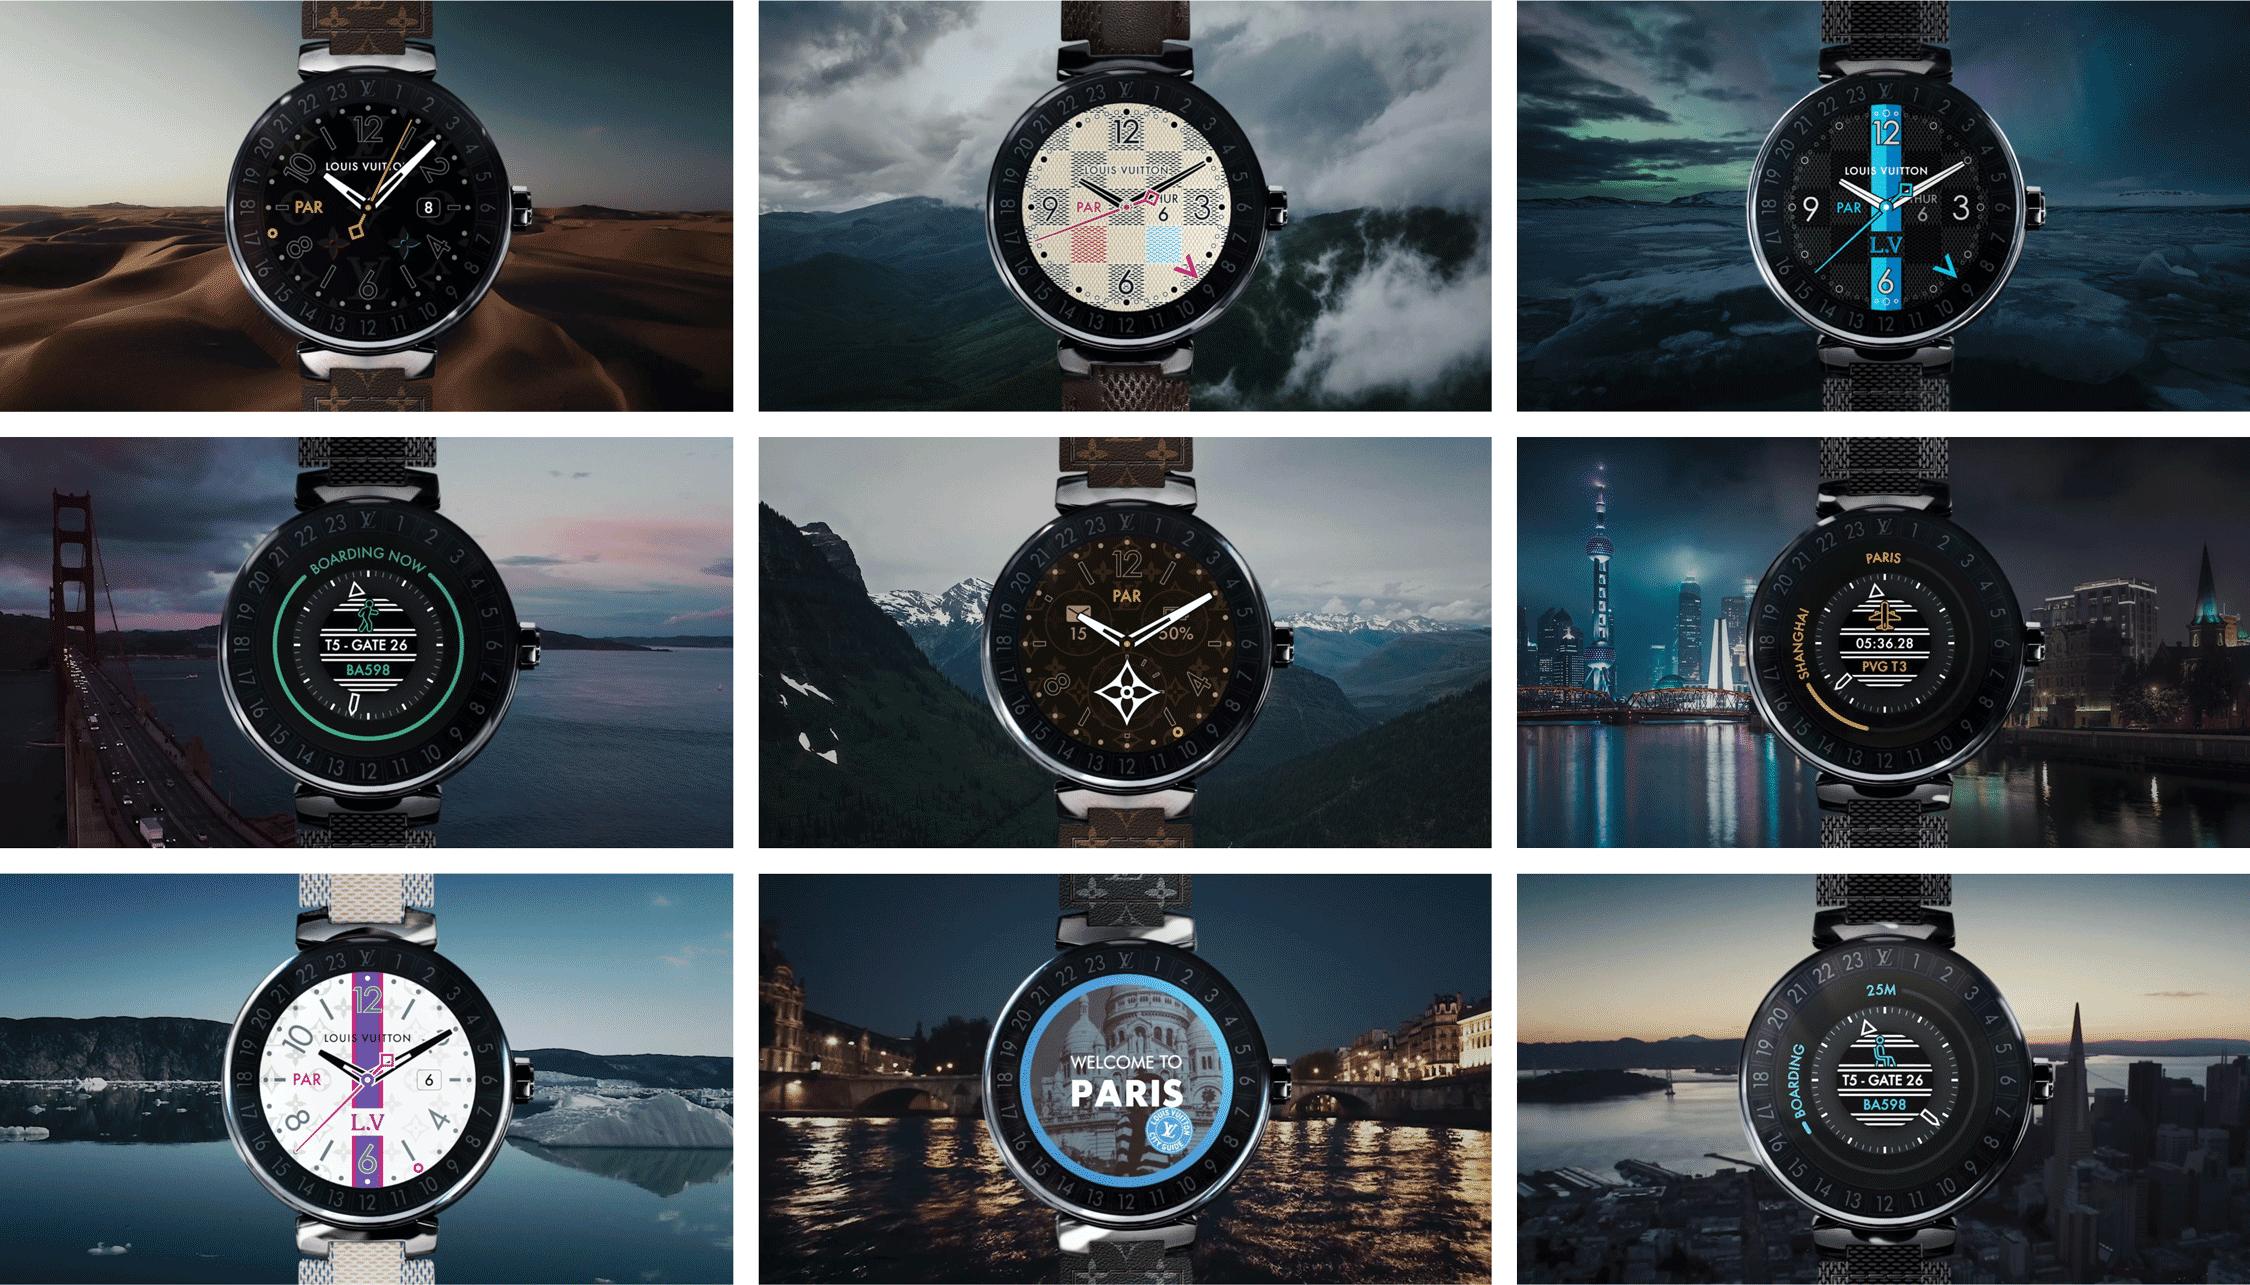 Louis Vuitton – Tambour Horizon